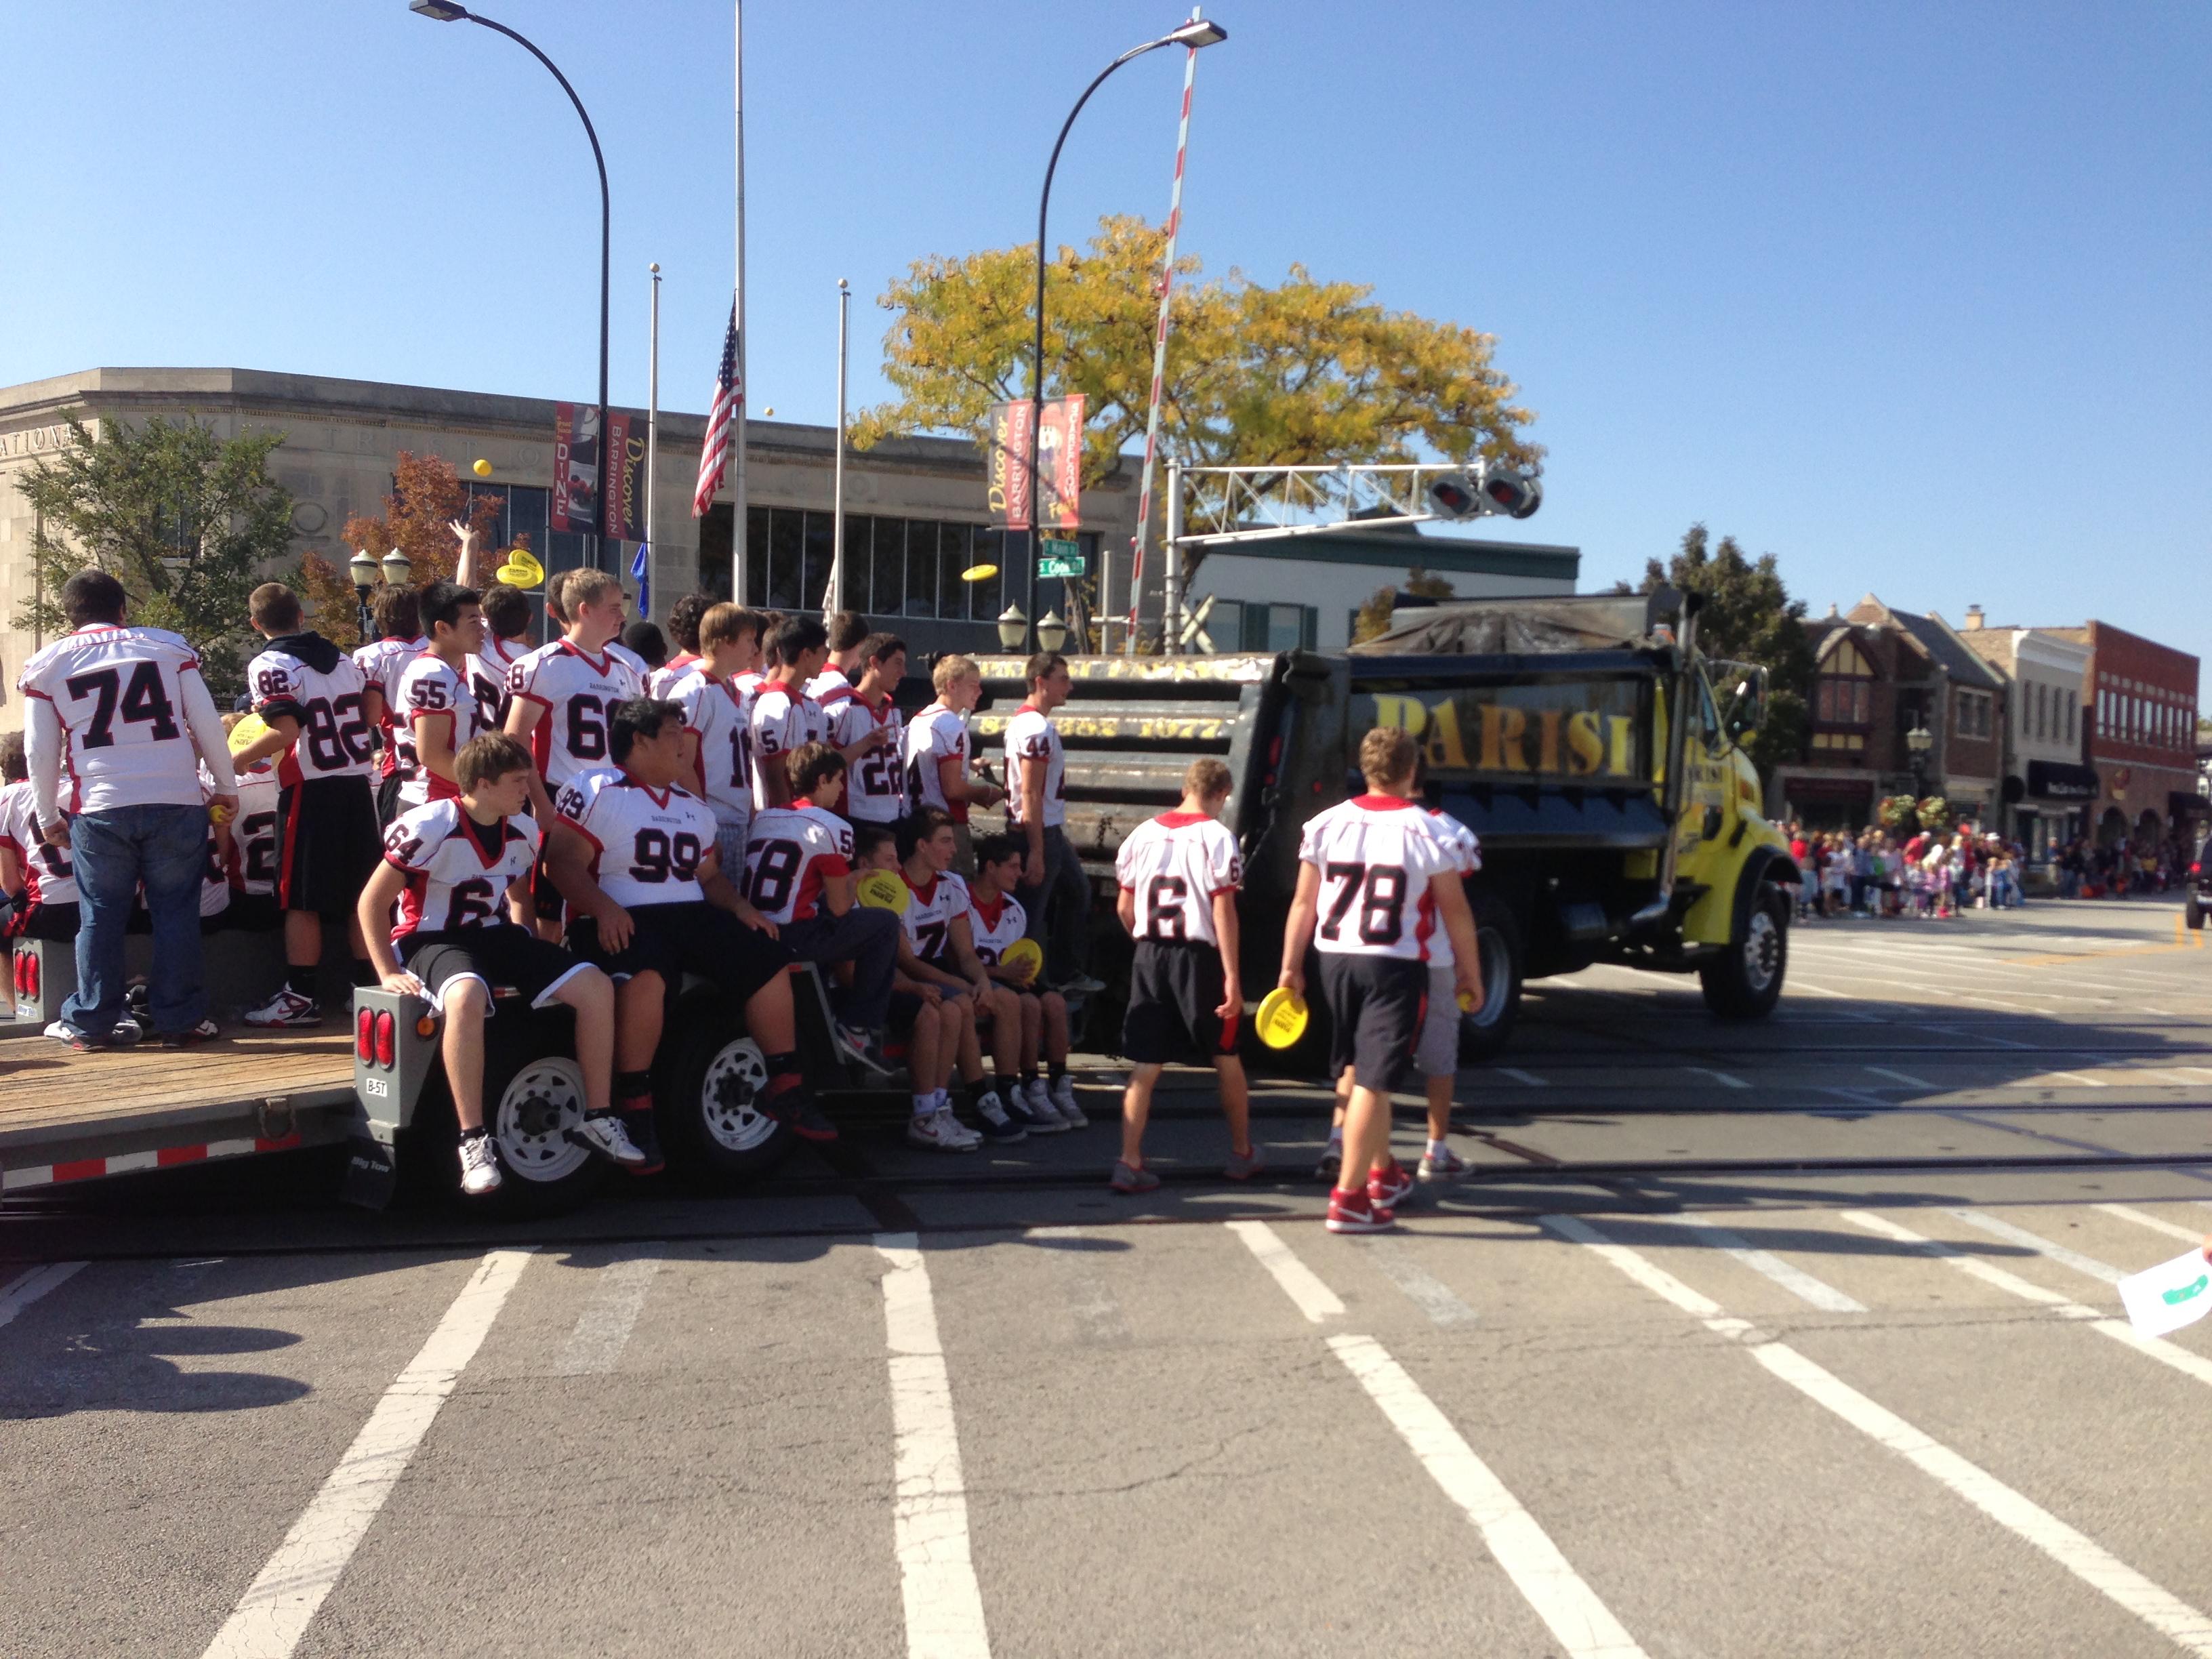 Parade football team